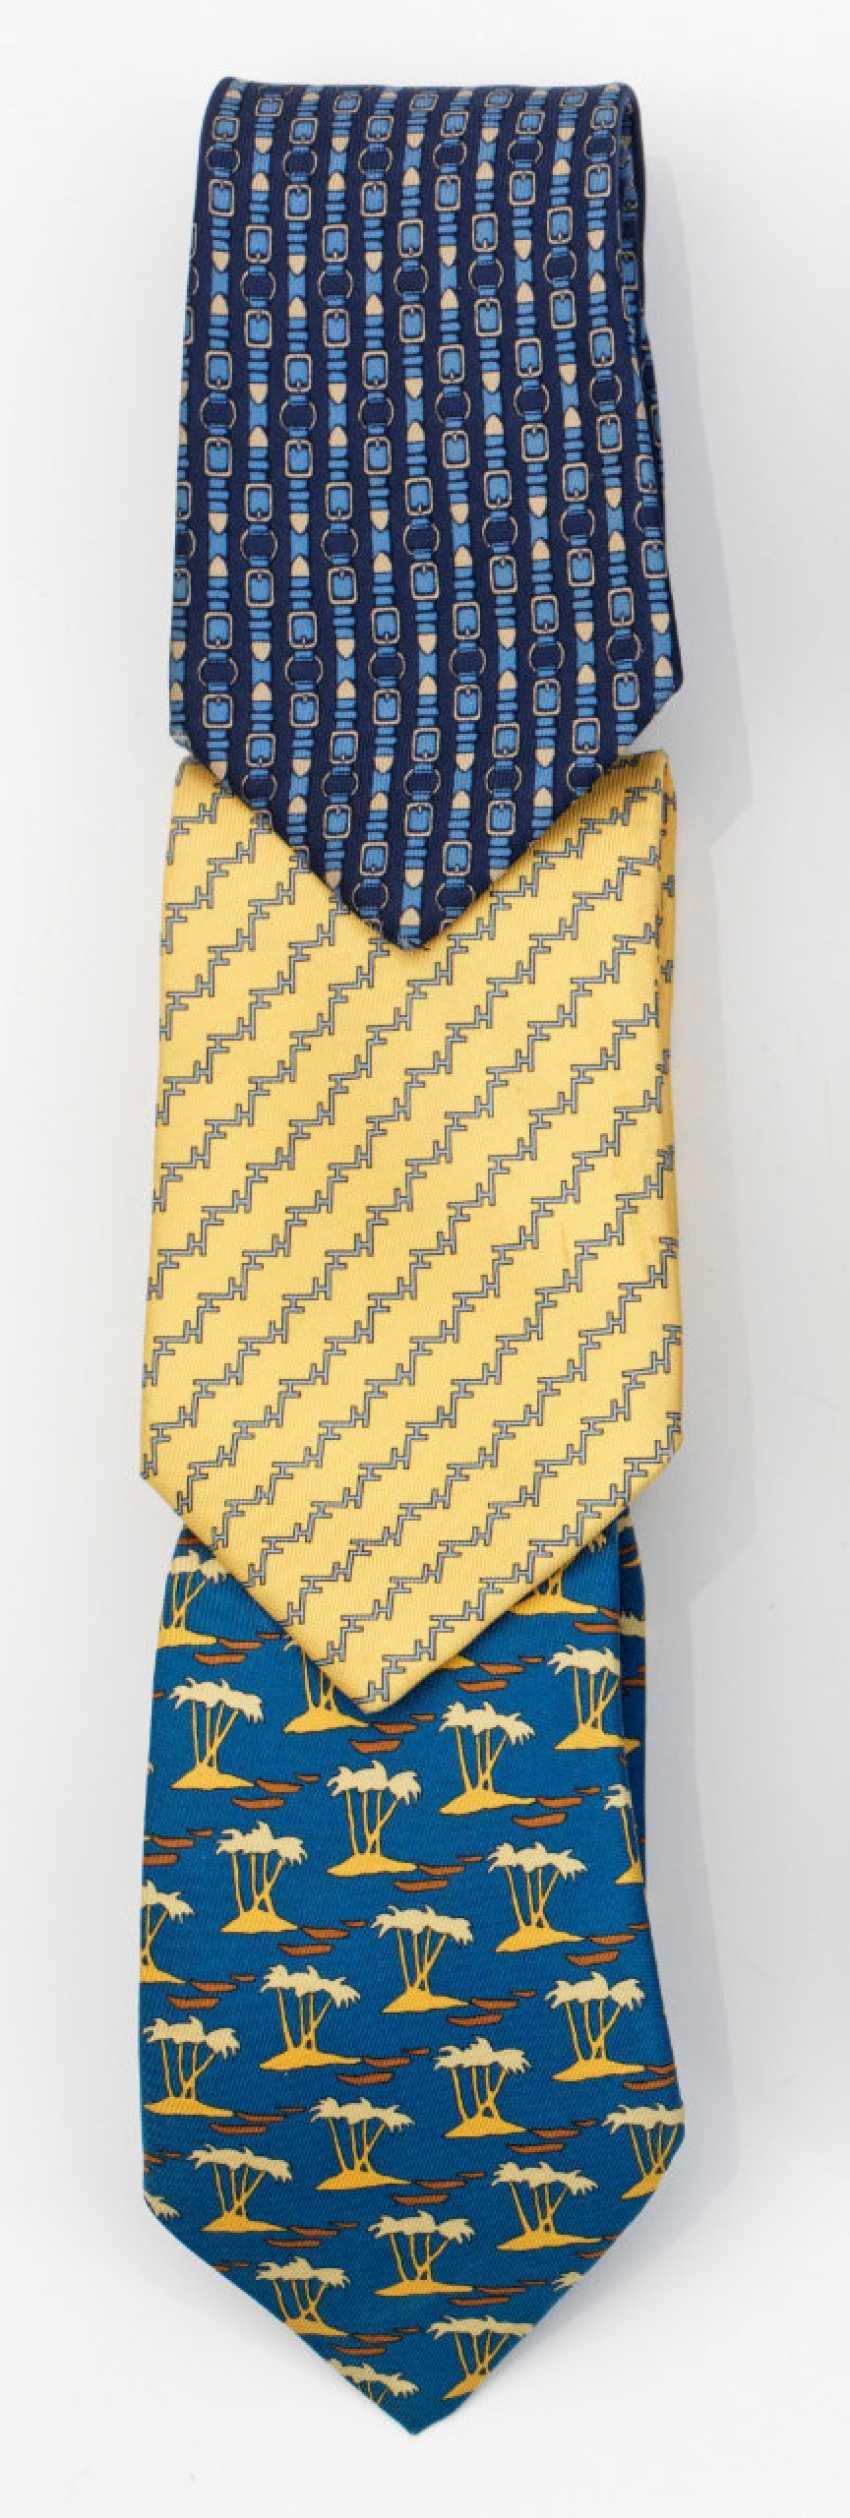 Three silk ties from HERMÈS - photo 1